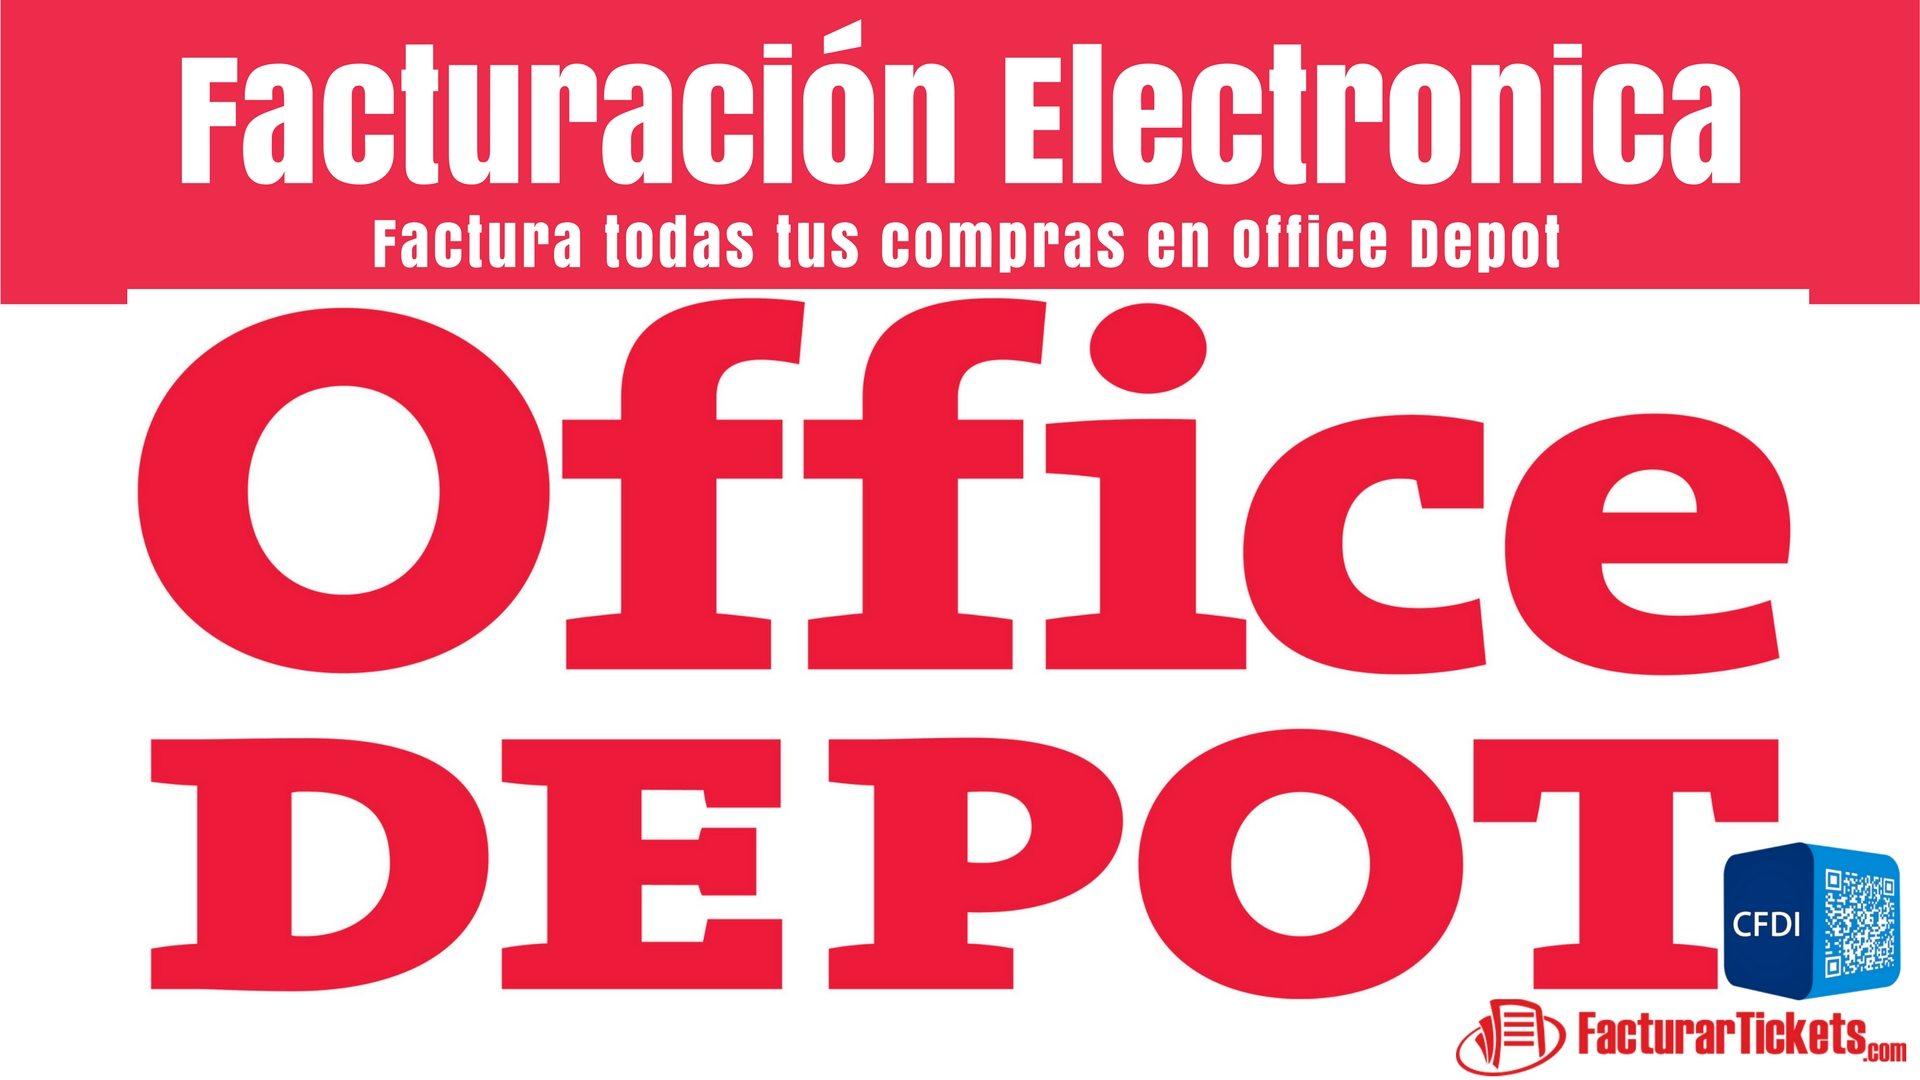 Office Depot Facturacion Electronica